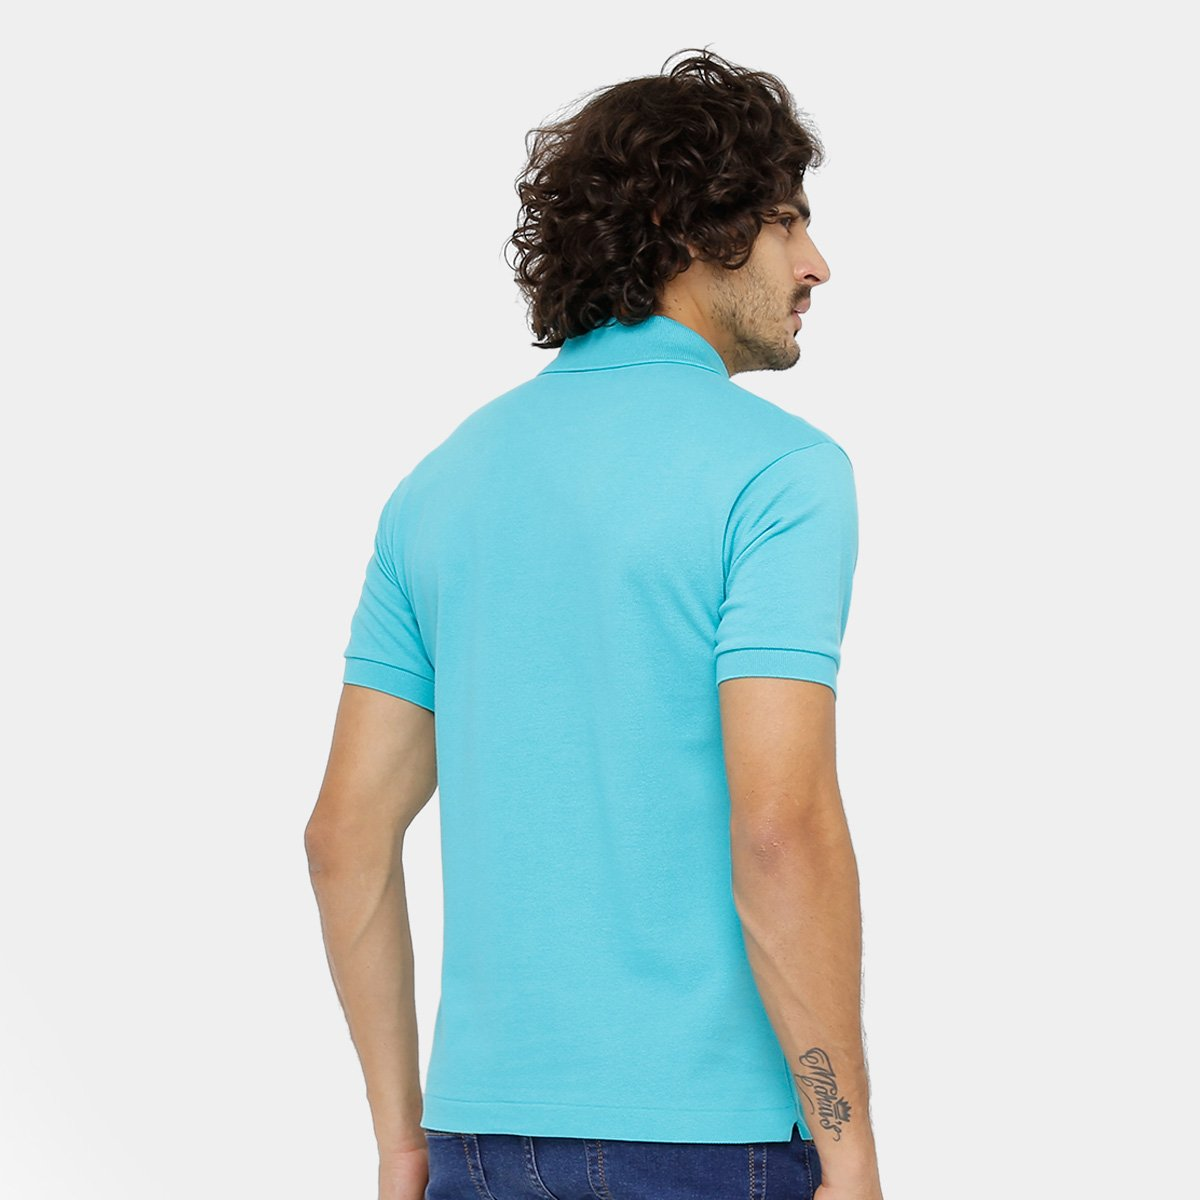 Camisa Polo Lacoste Piquet Original Fit Masculina - Azul Turquesa ... 6b28d73b62